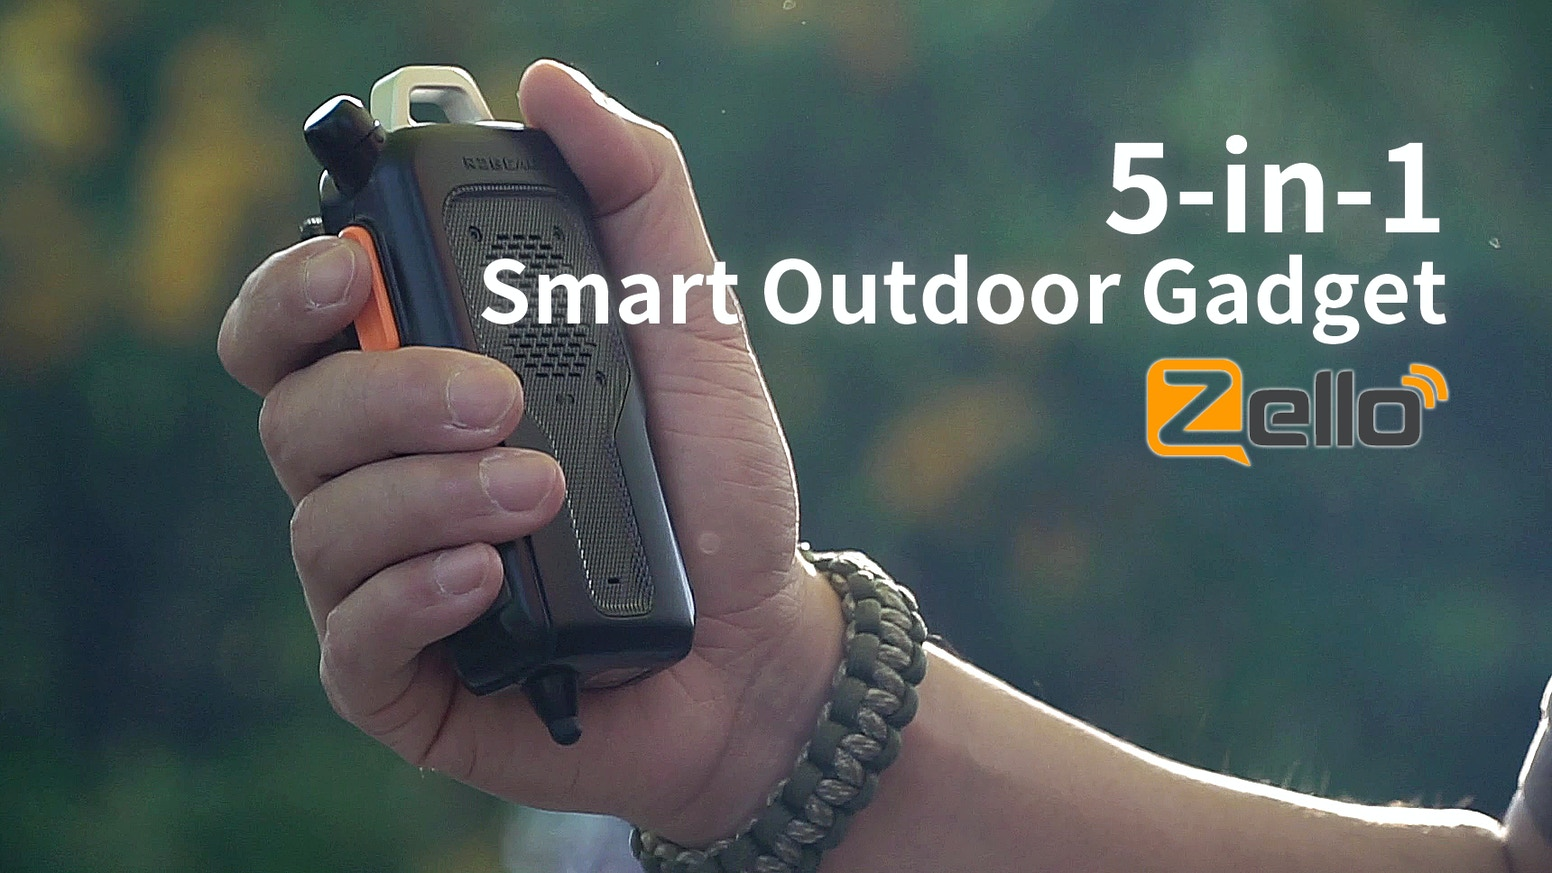 Innovative outdoor gadget has five essential functions for outdoor activities and adventures.